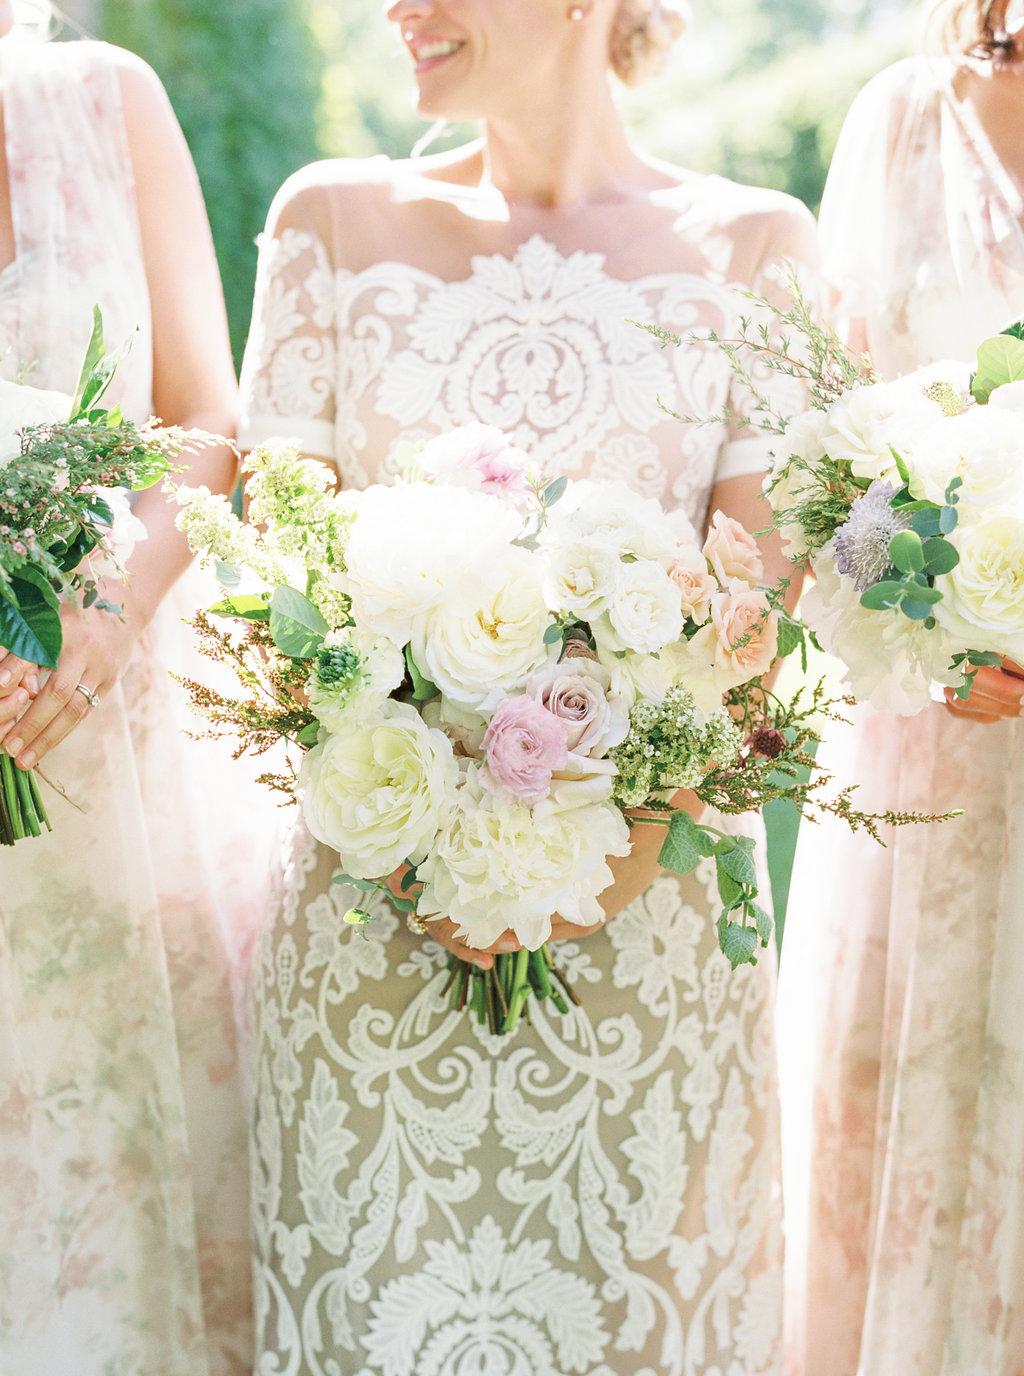 alegria-by-design-wedding-planner-planning-event-design-santa-barbara-day-of-coordinator-kestrel-park-santa-ynez-fields-castle-lavender-garden-mrs-box (17).jpg